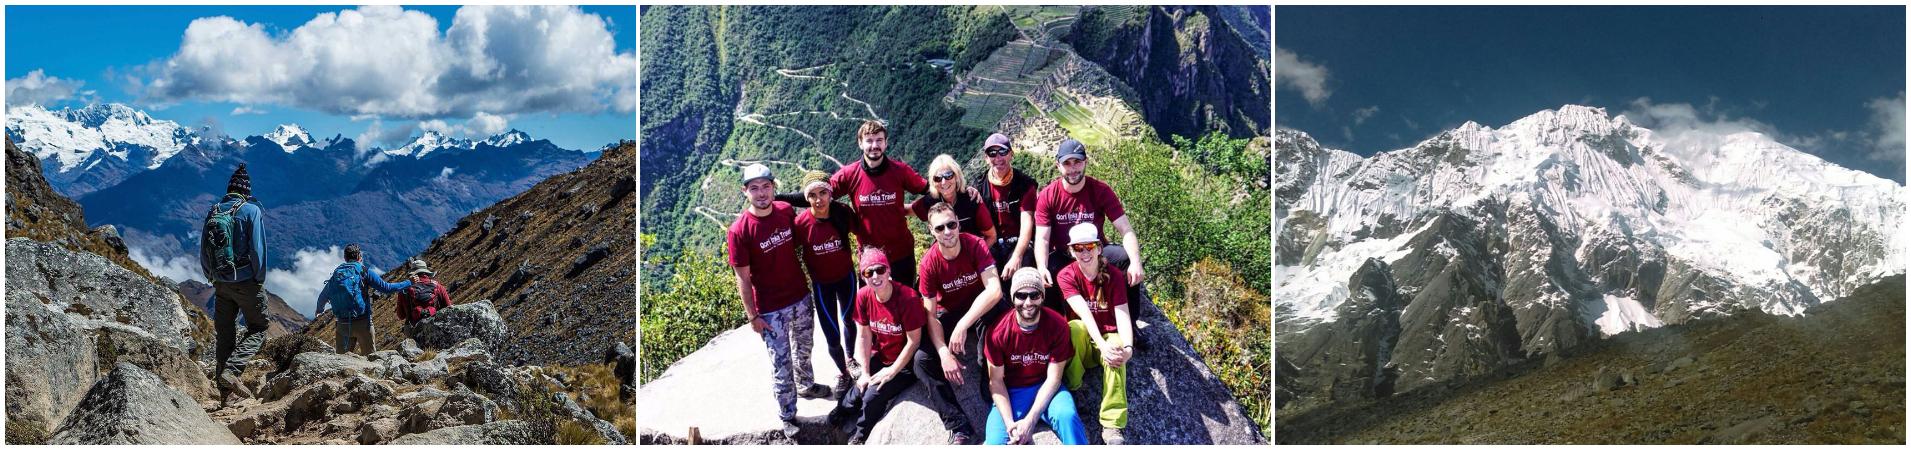 Salkantay Trek a Machu Picchu 4 dias qori inka travel